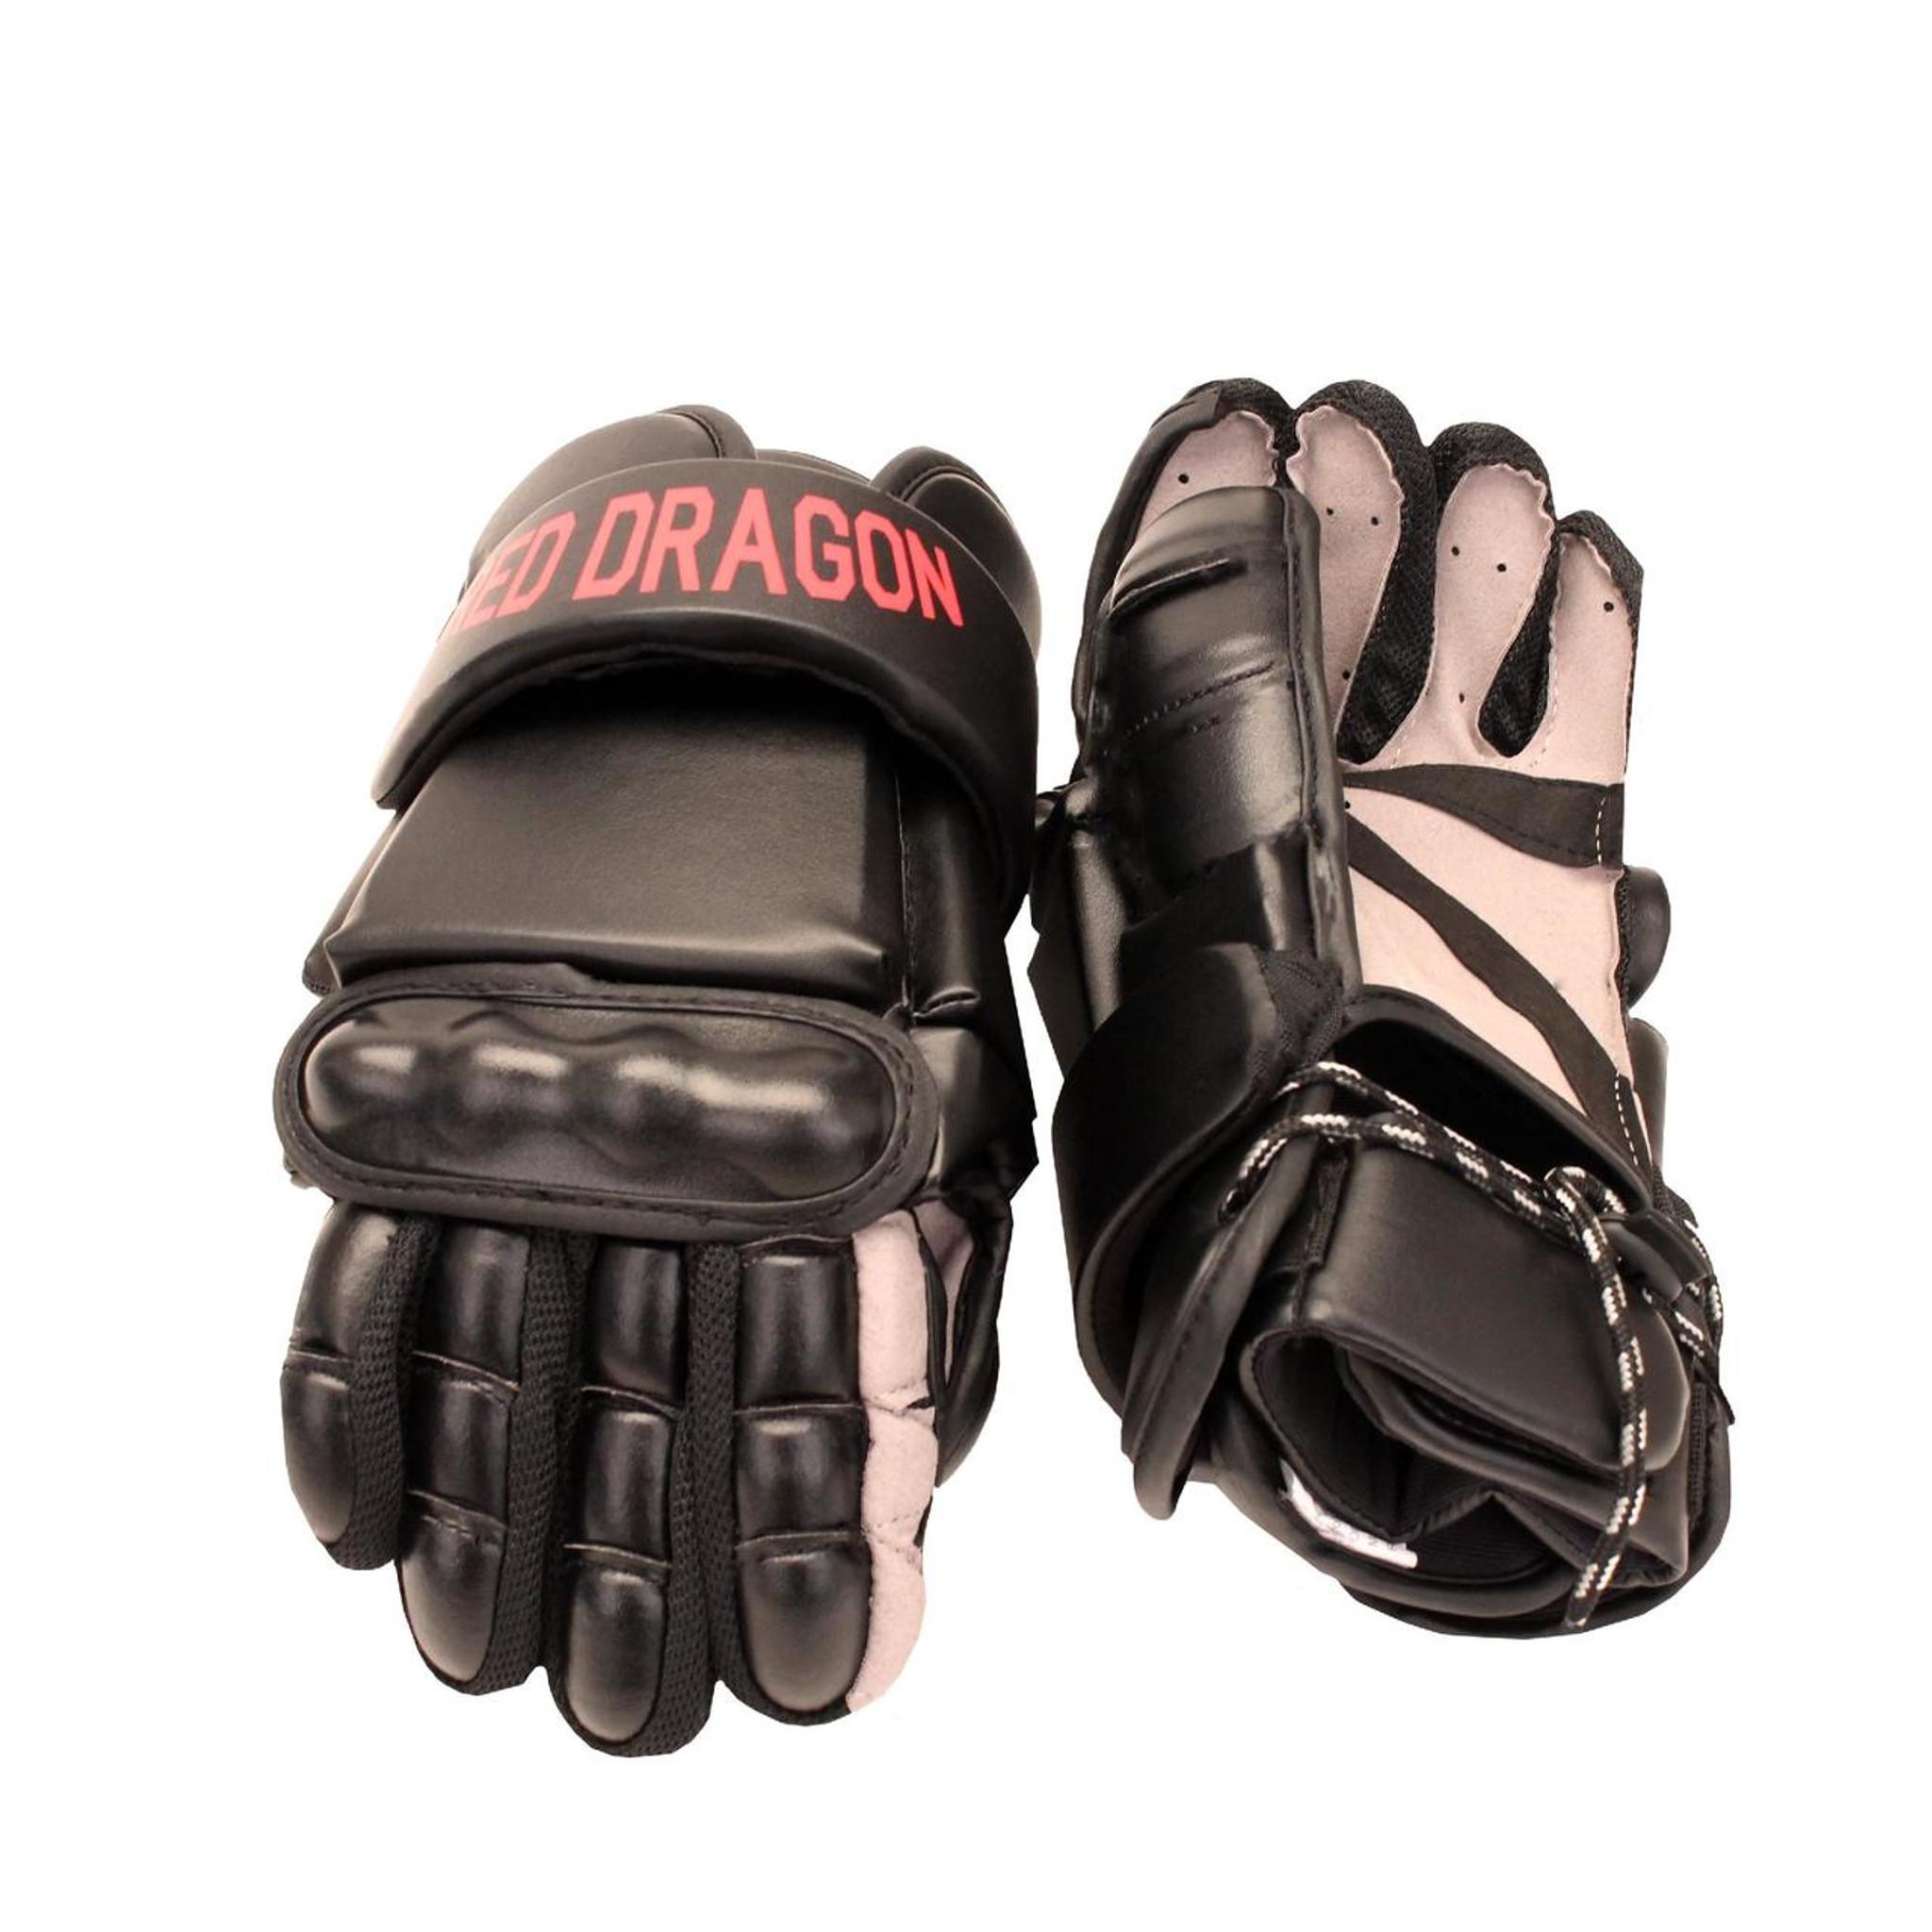 b60a1966db24a0 Red Dragon Hema Gloves - 12